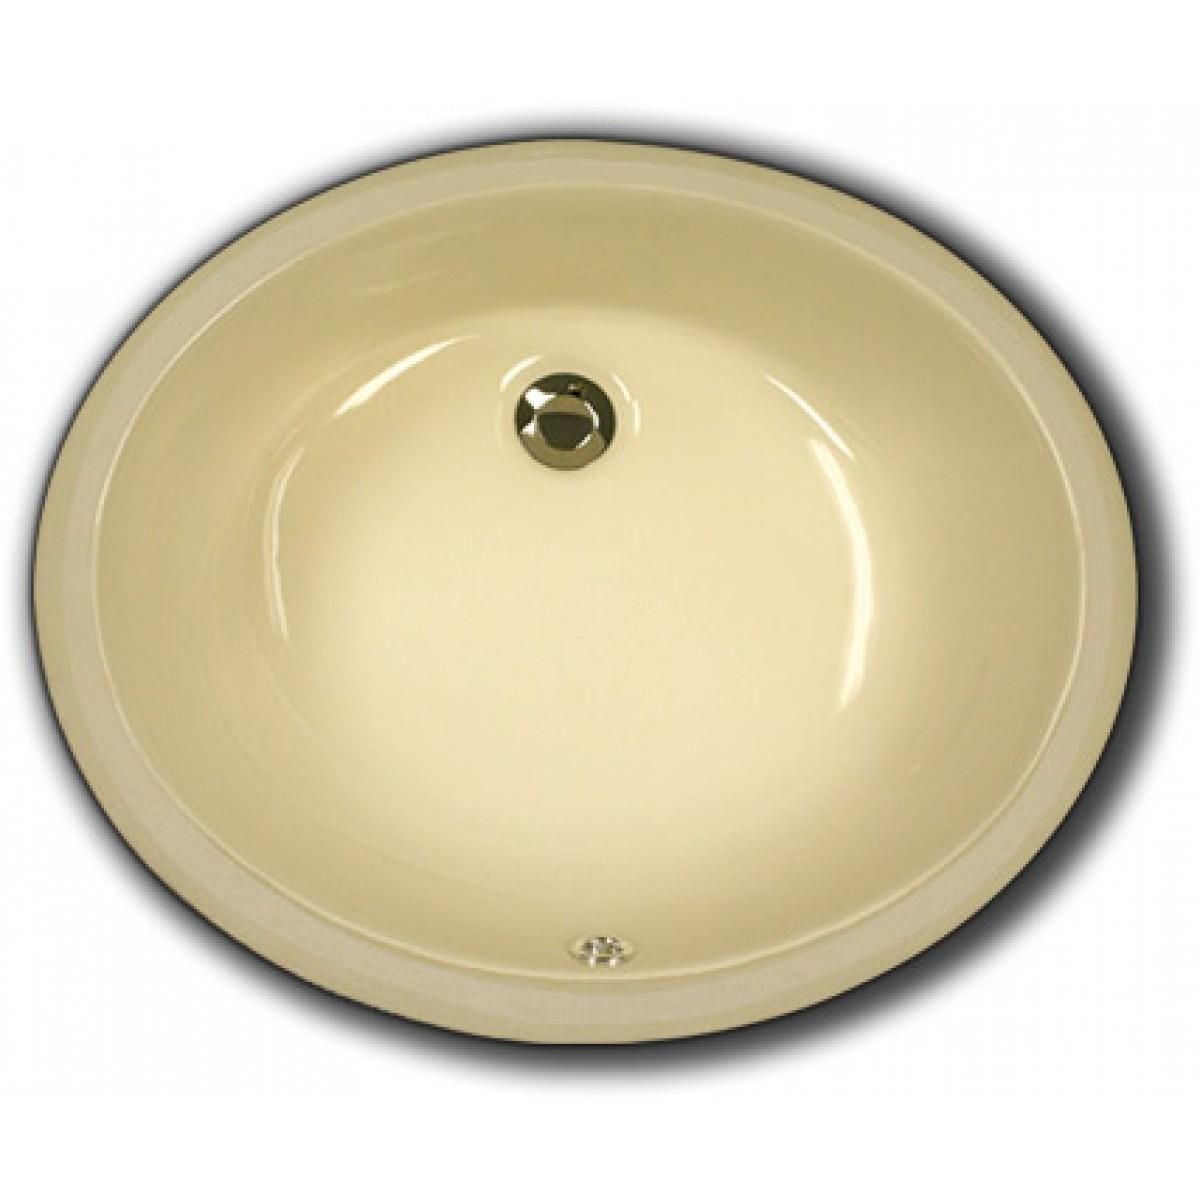 Biscuit Porcelain Ceramic Vanity Undermount Bathroom Vessel Sink 17 X 14 6 Inch